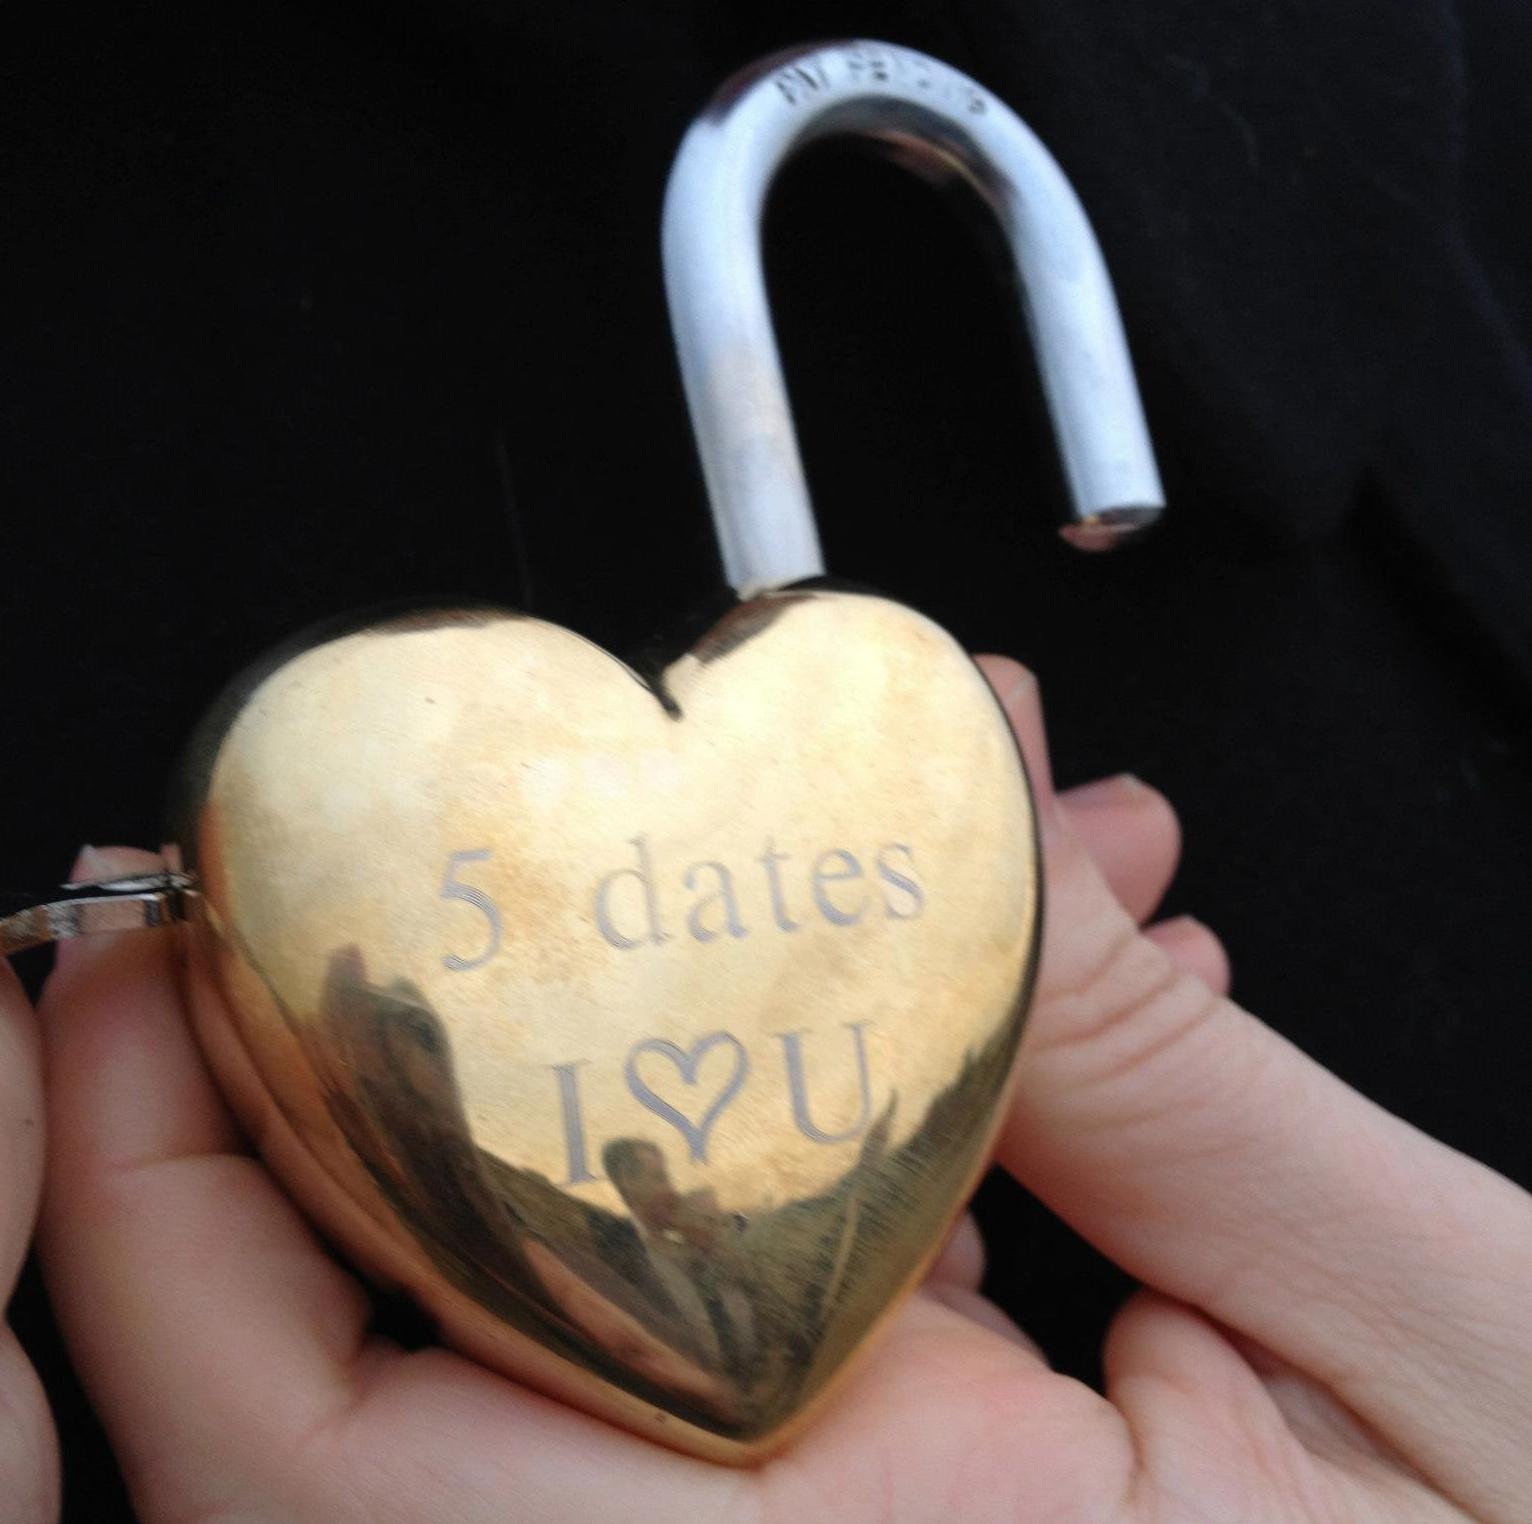 Image 2 of Love Lock Bridge Proposal in Paris